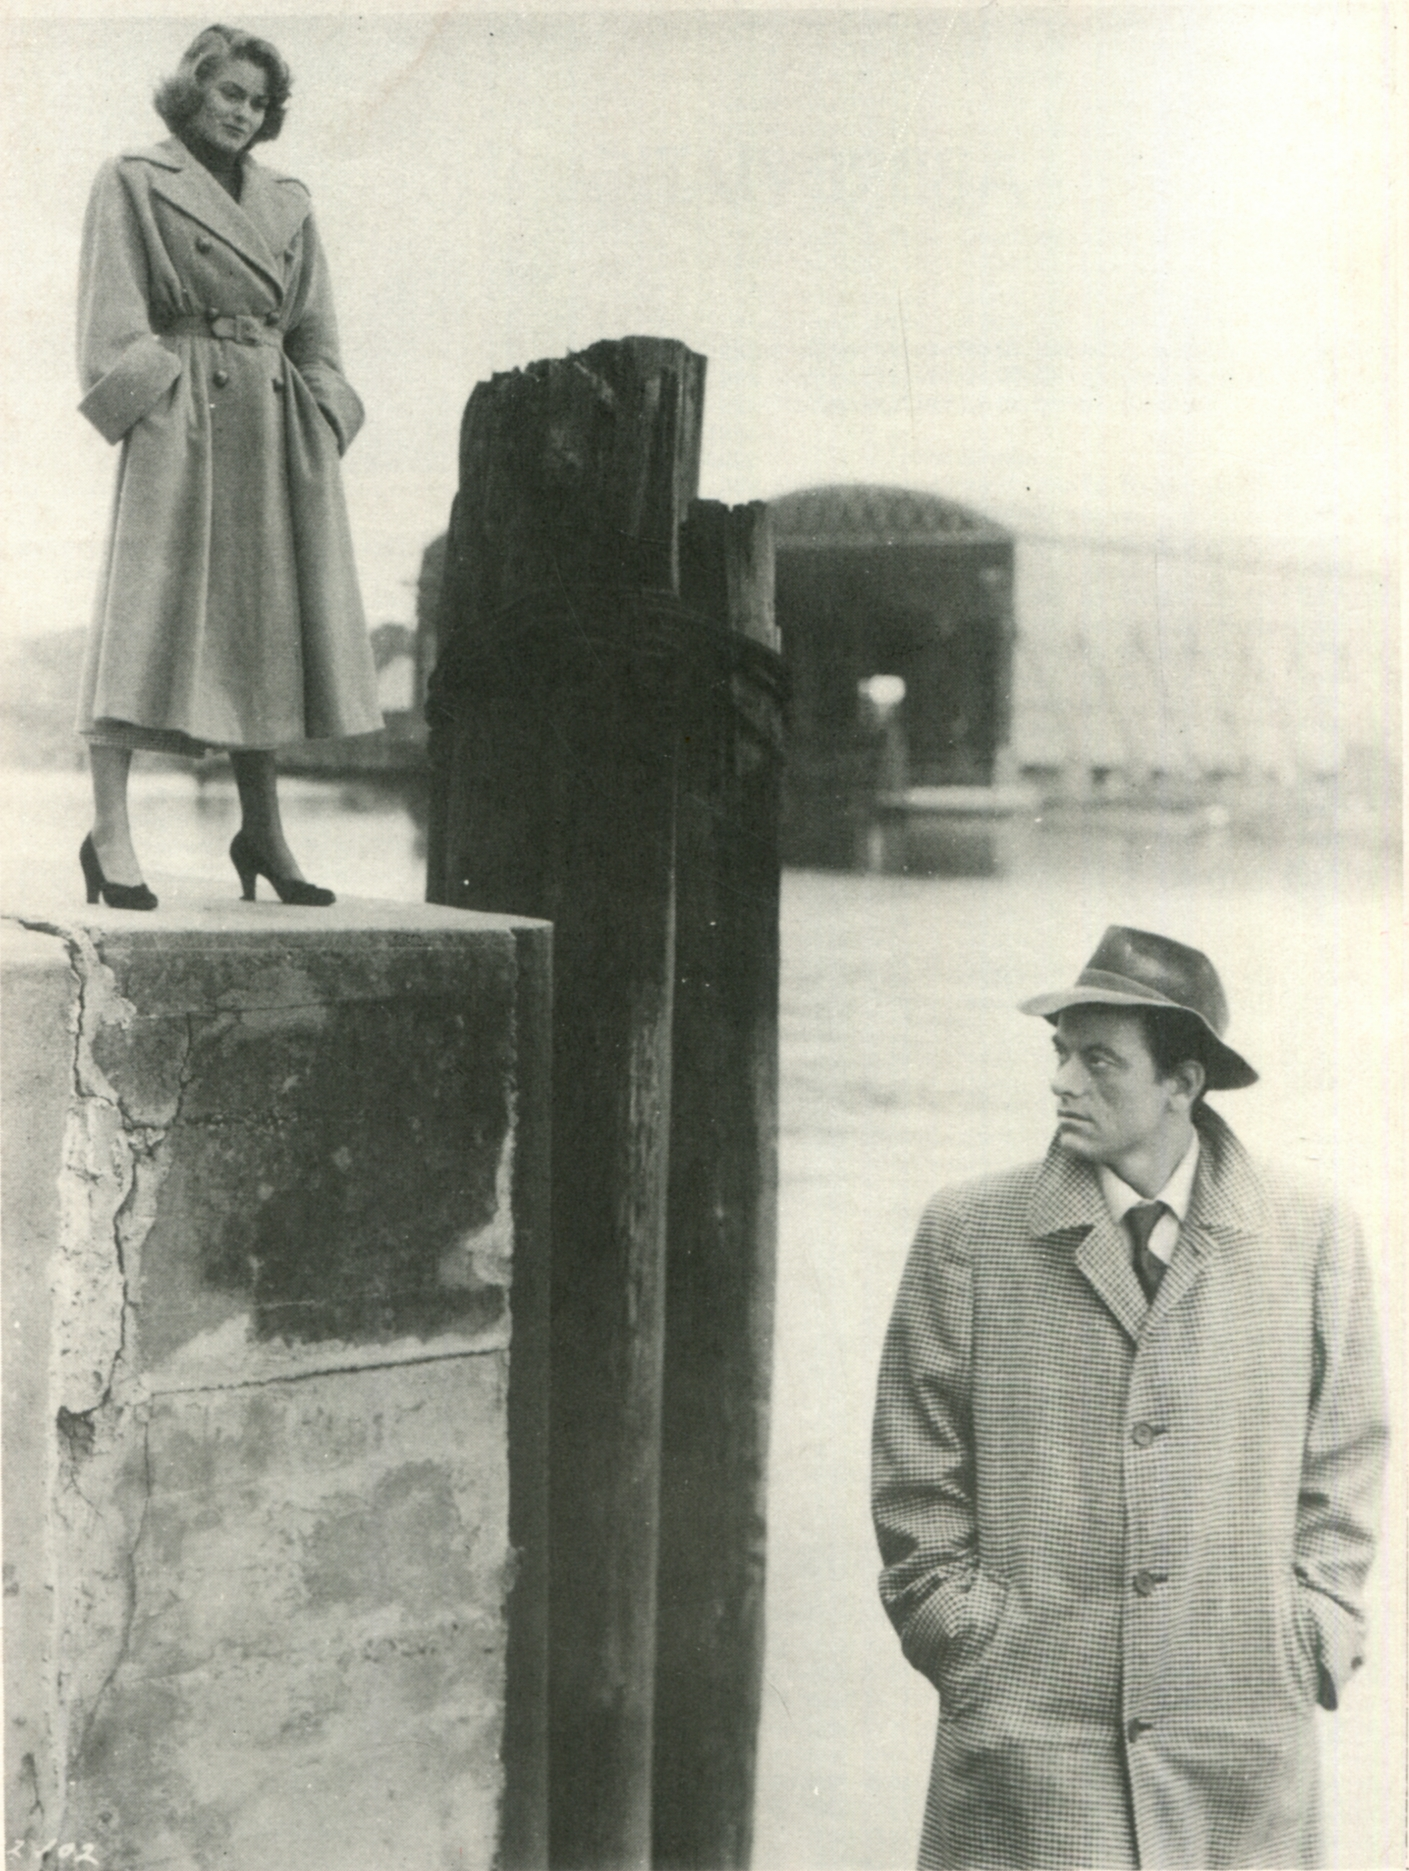 Joanne Dru and John Ireland in All the King's Men (1949)